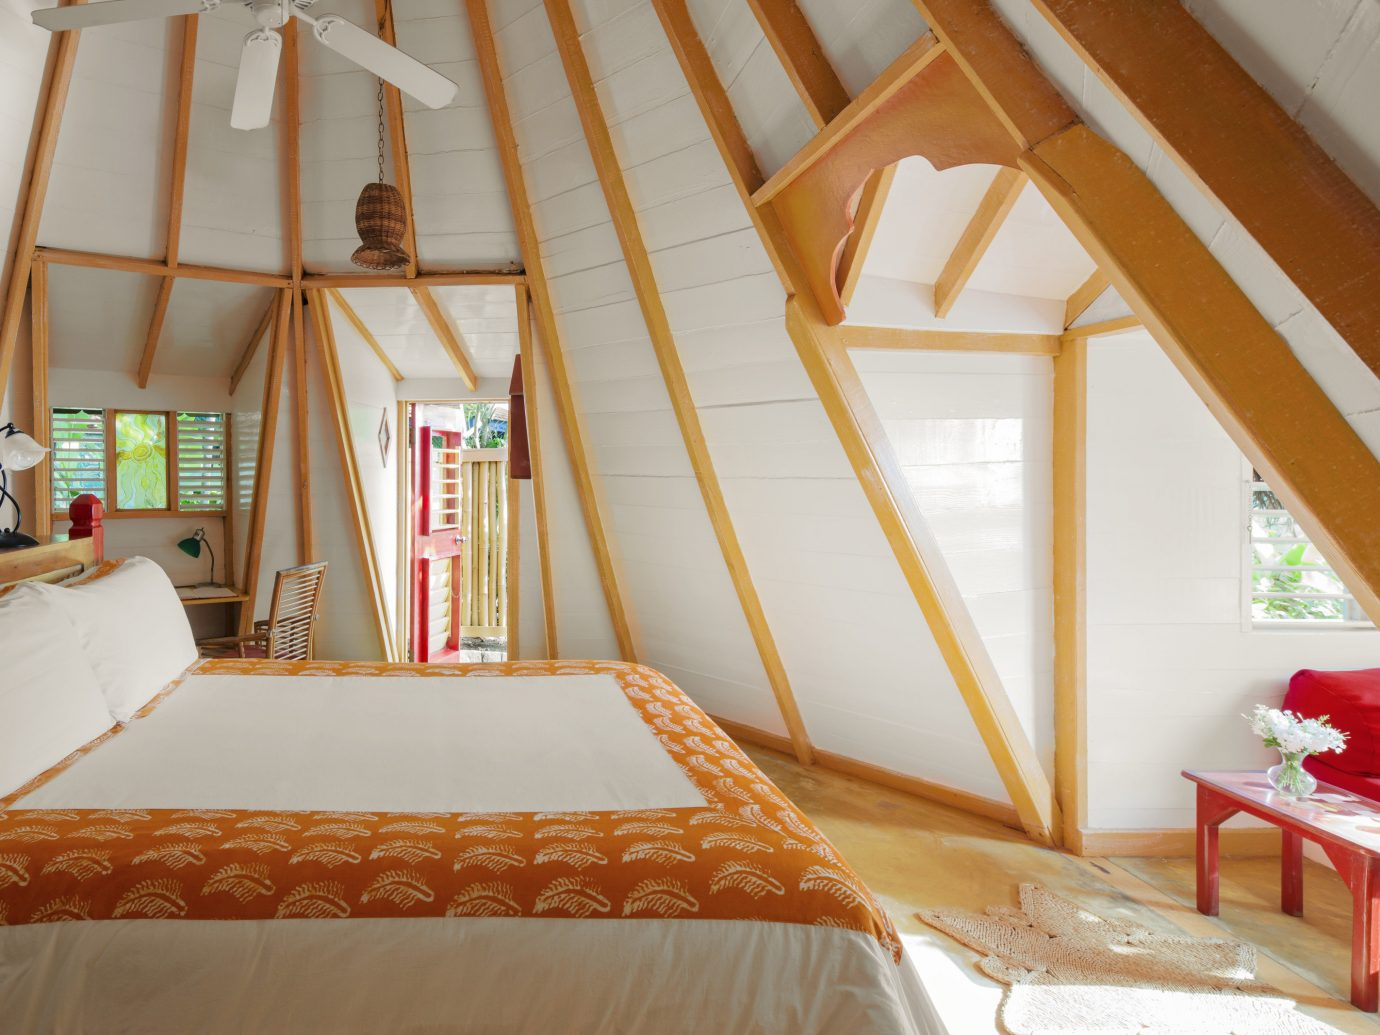 Hotels indoor room property building bed Resort cottage Bedroom attic Villa Suite interior design estate